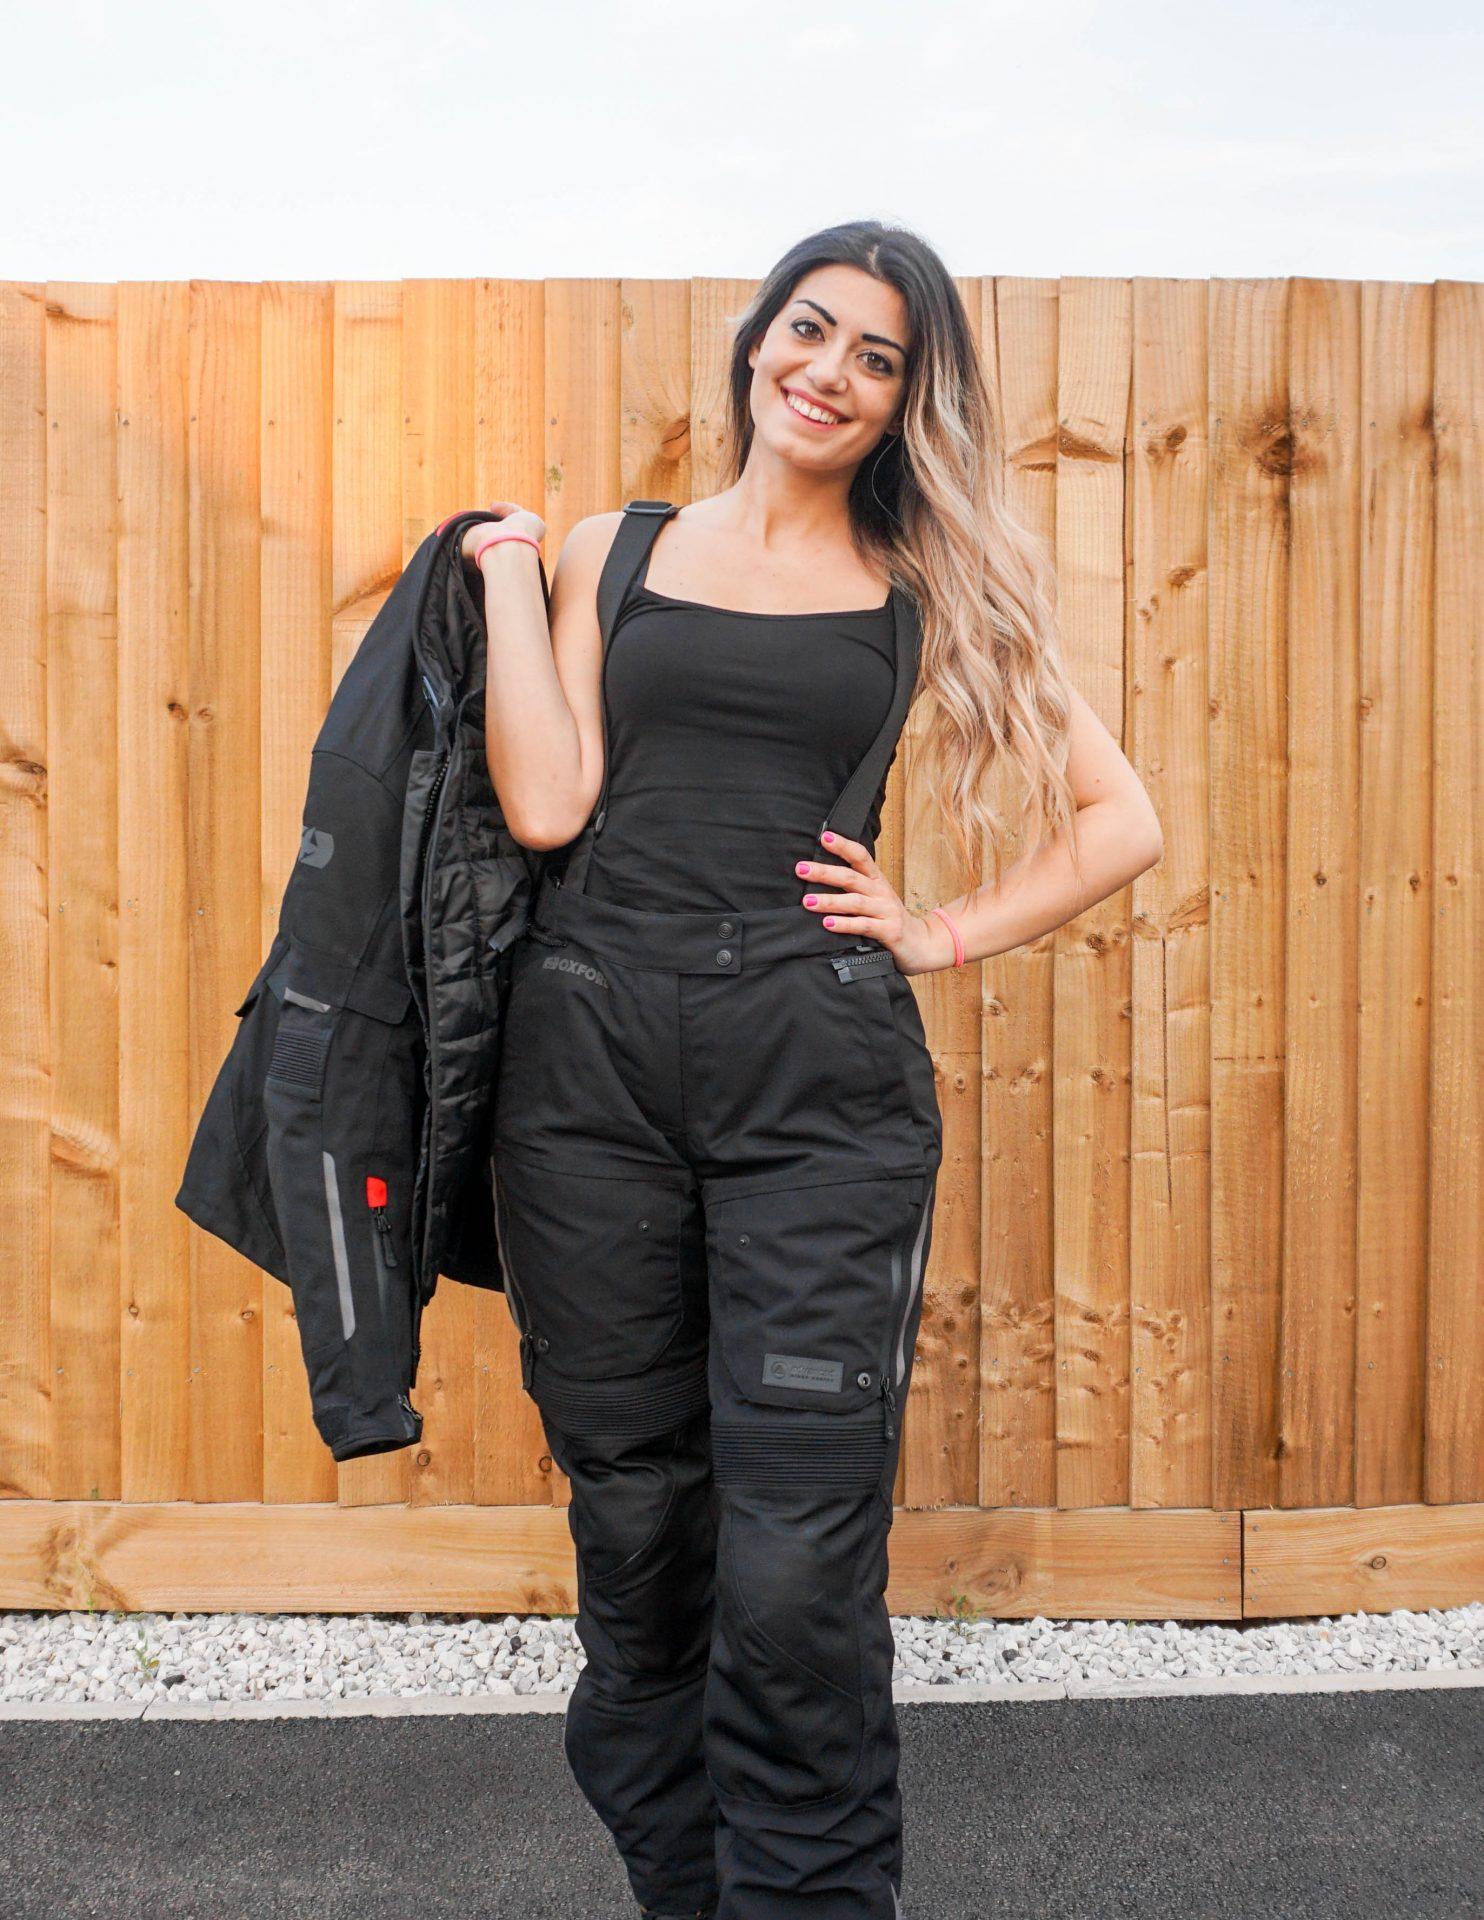 DSC04866-scaled Women's Mondial Laminate Jacket